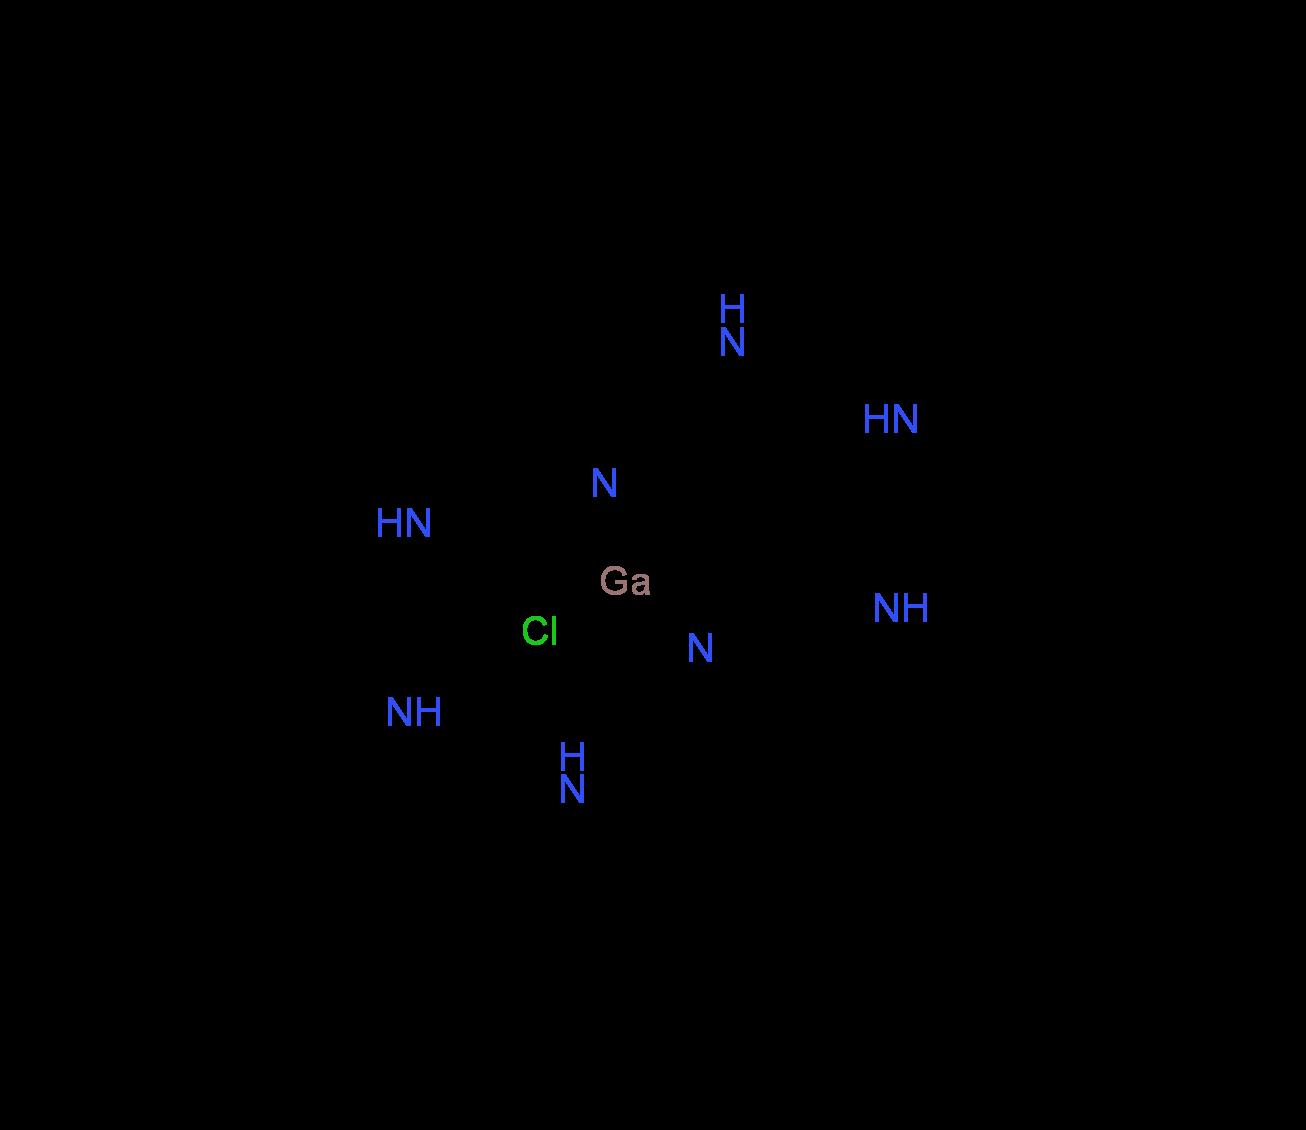 手绘�:(�y��y/��h�y�_氯化2,3-萘酞菁镓